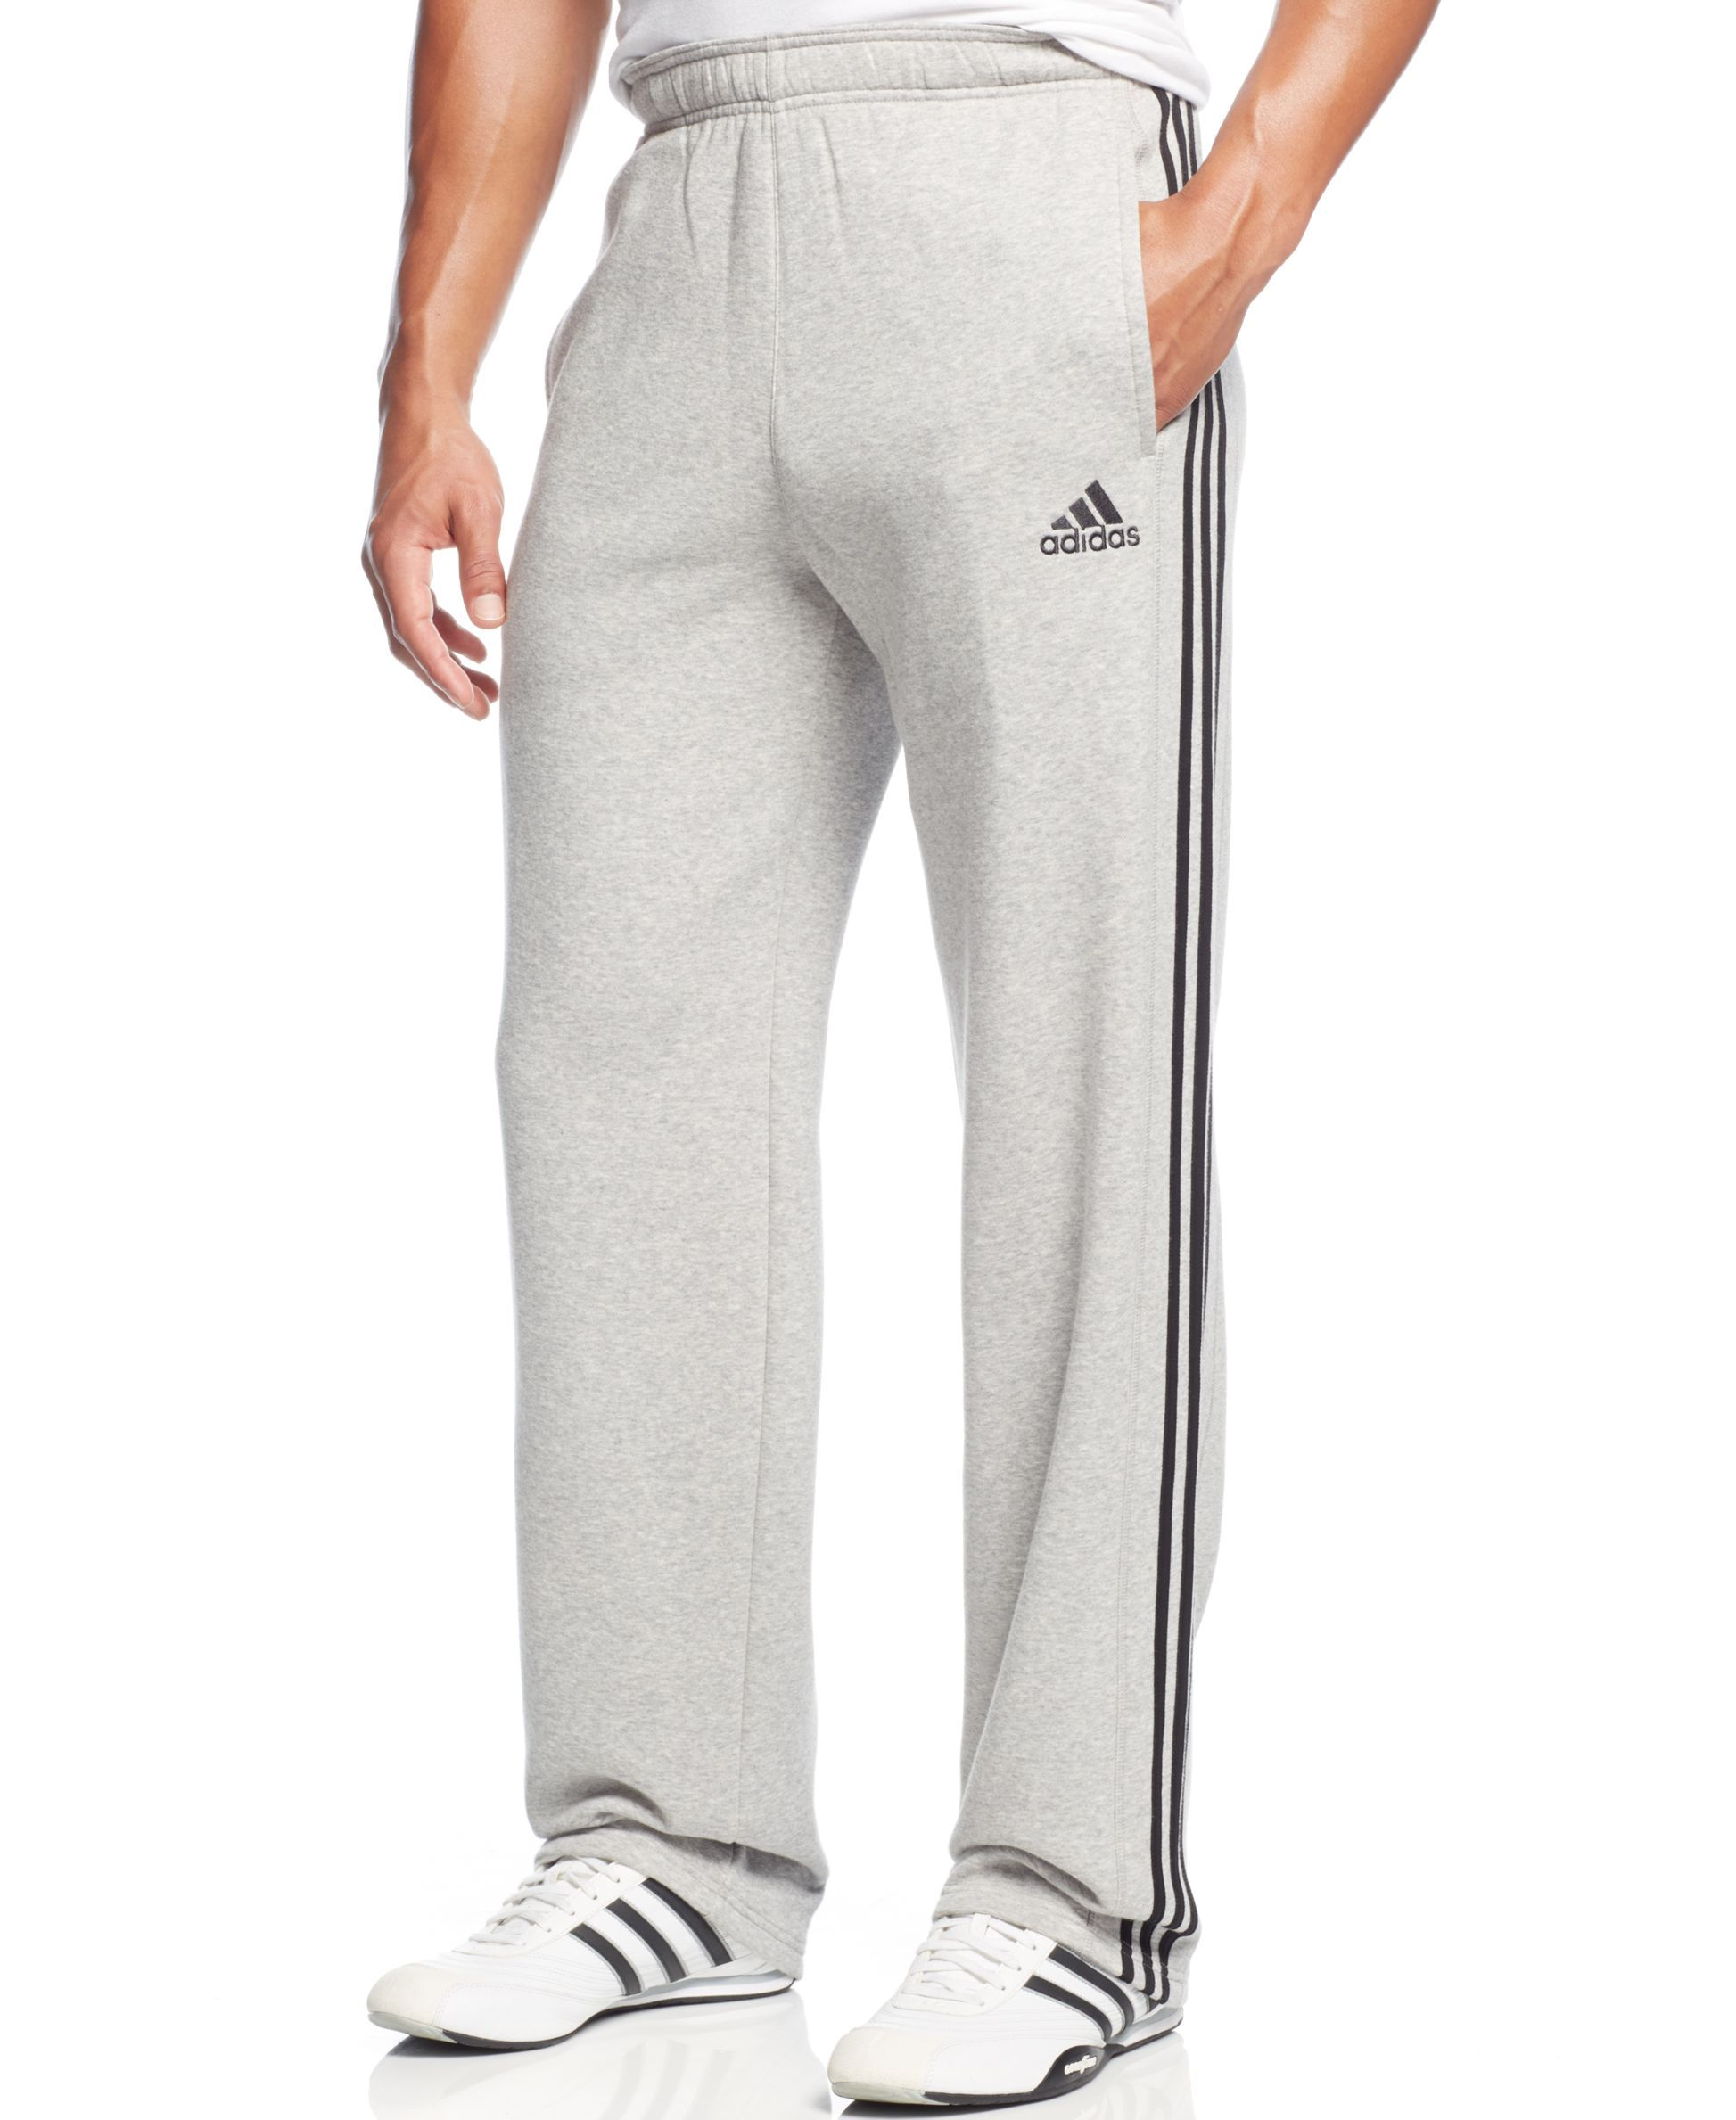 4e31acf23ef8fc adidas Essential Cotton Fleece Training Pants Trainingshosen